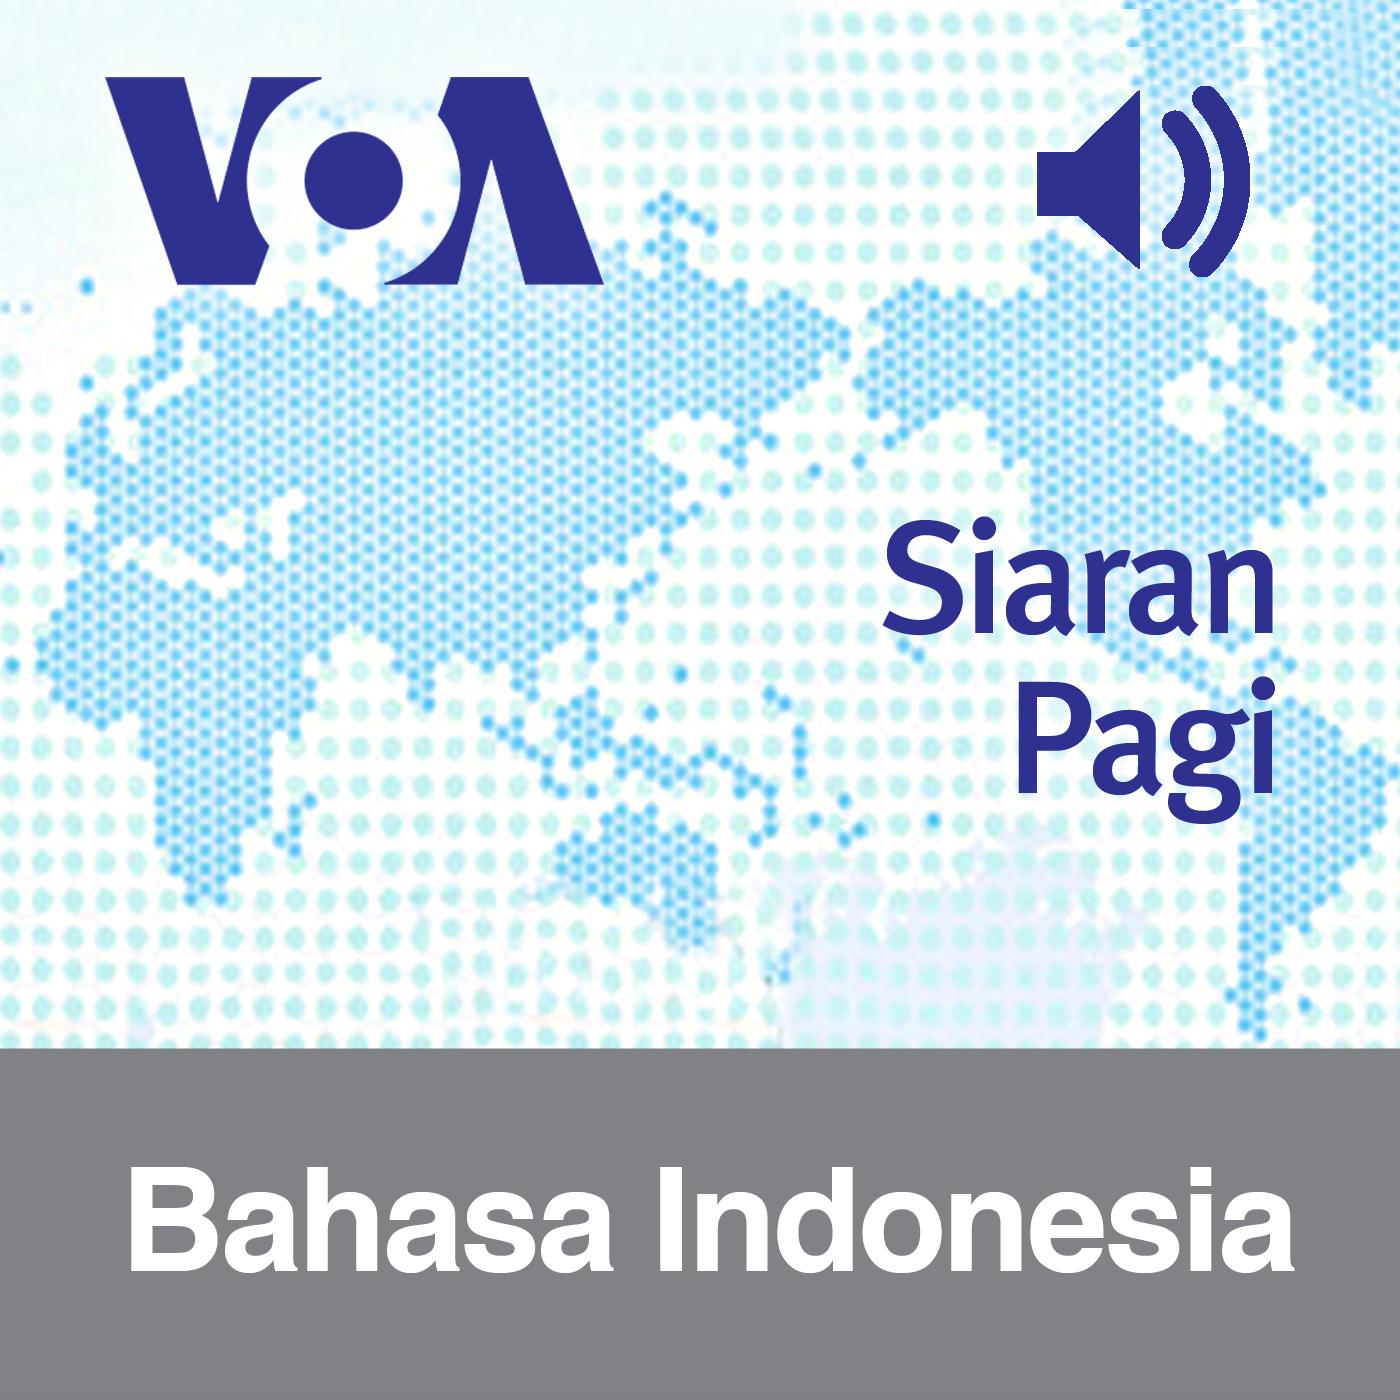 Siaran Pagi - Voice of America | Bahasa Indonesia